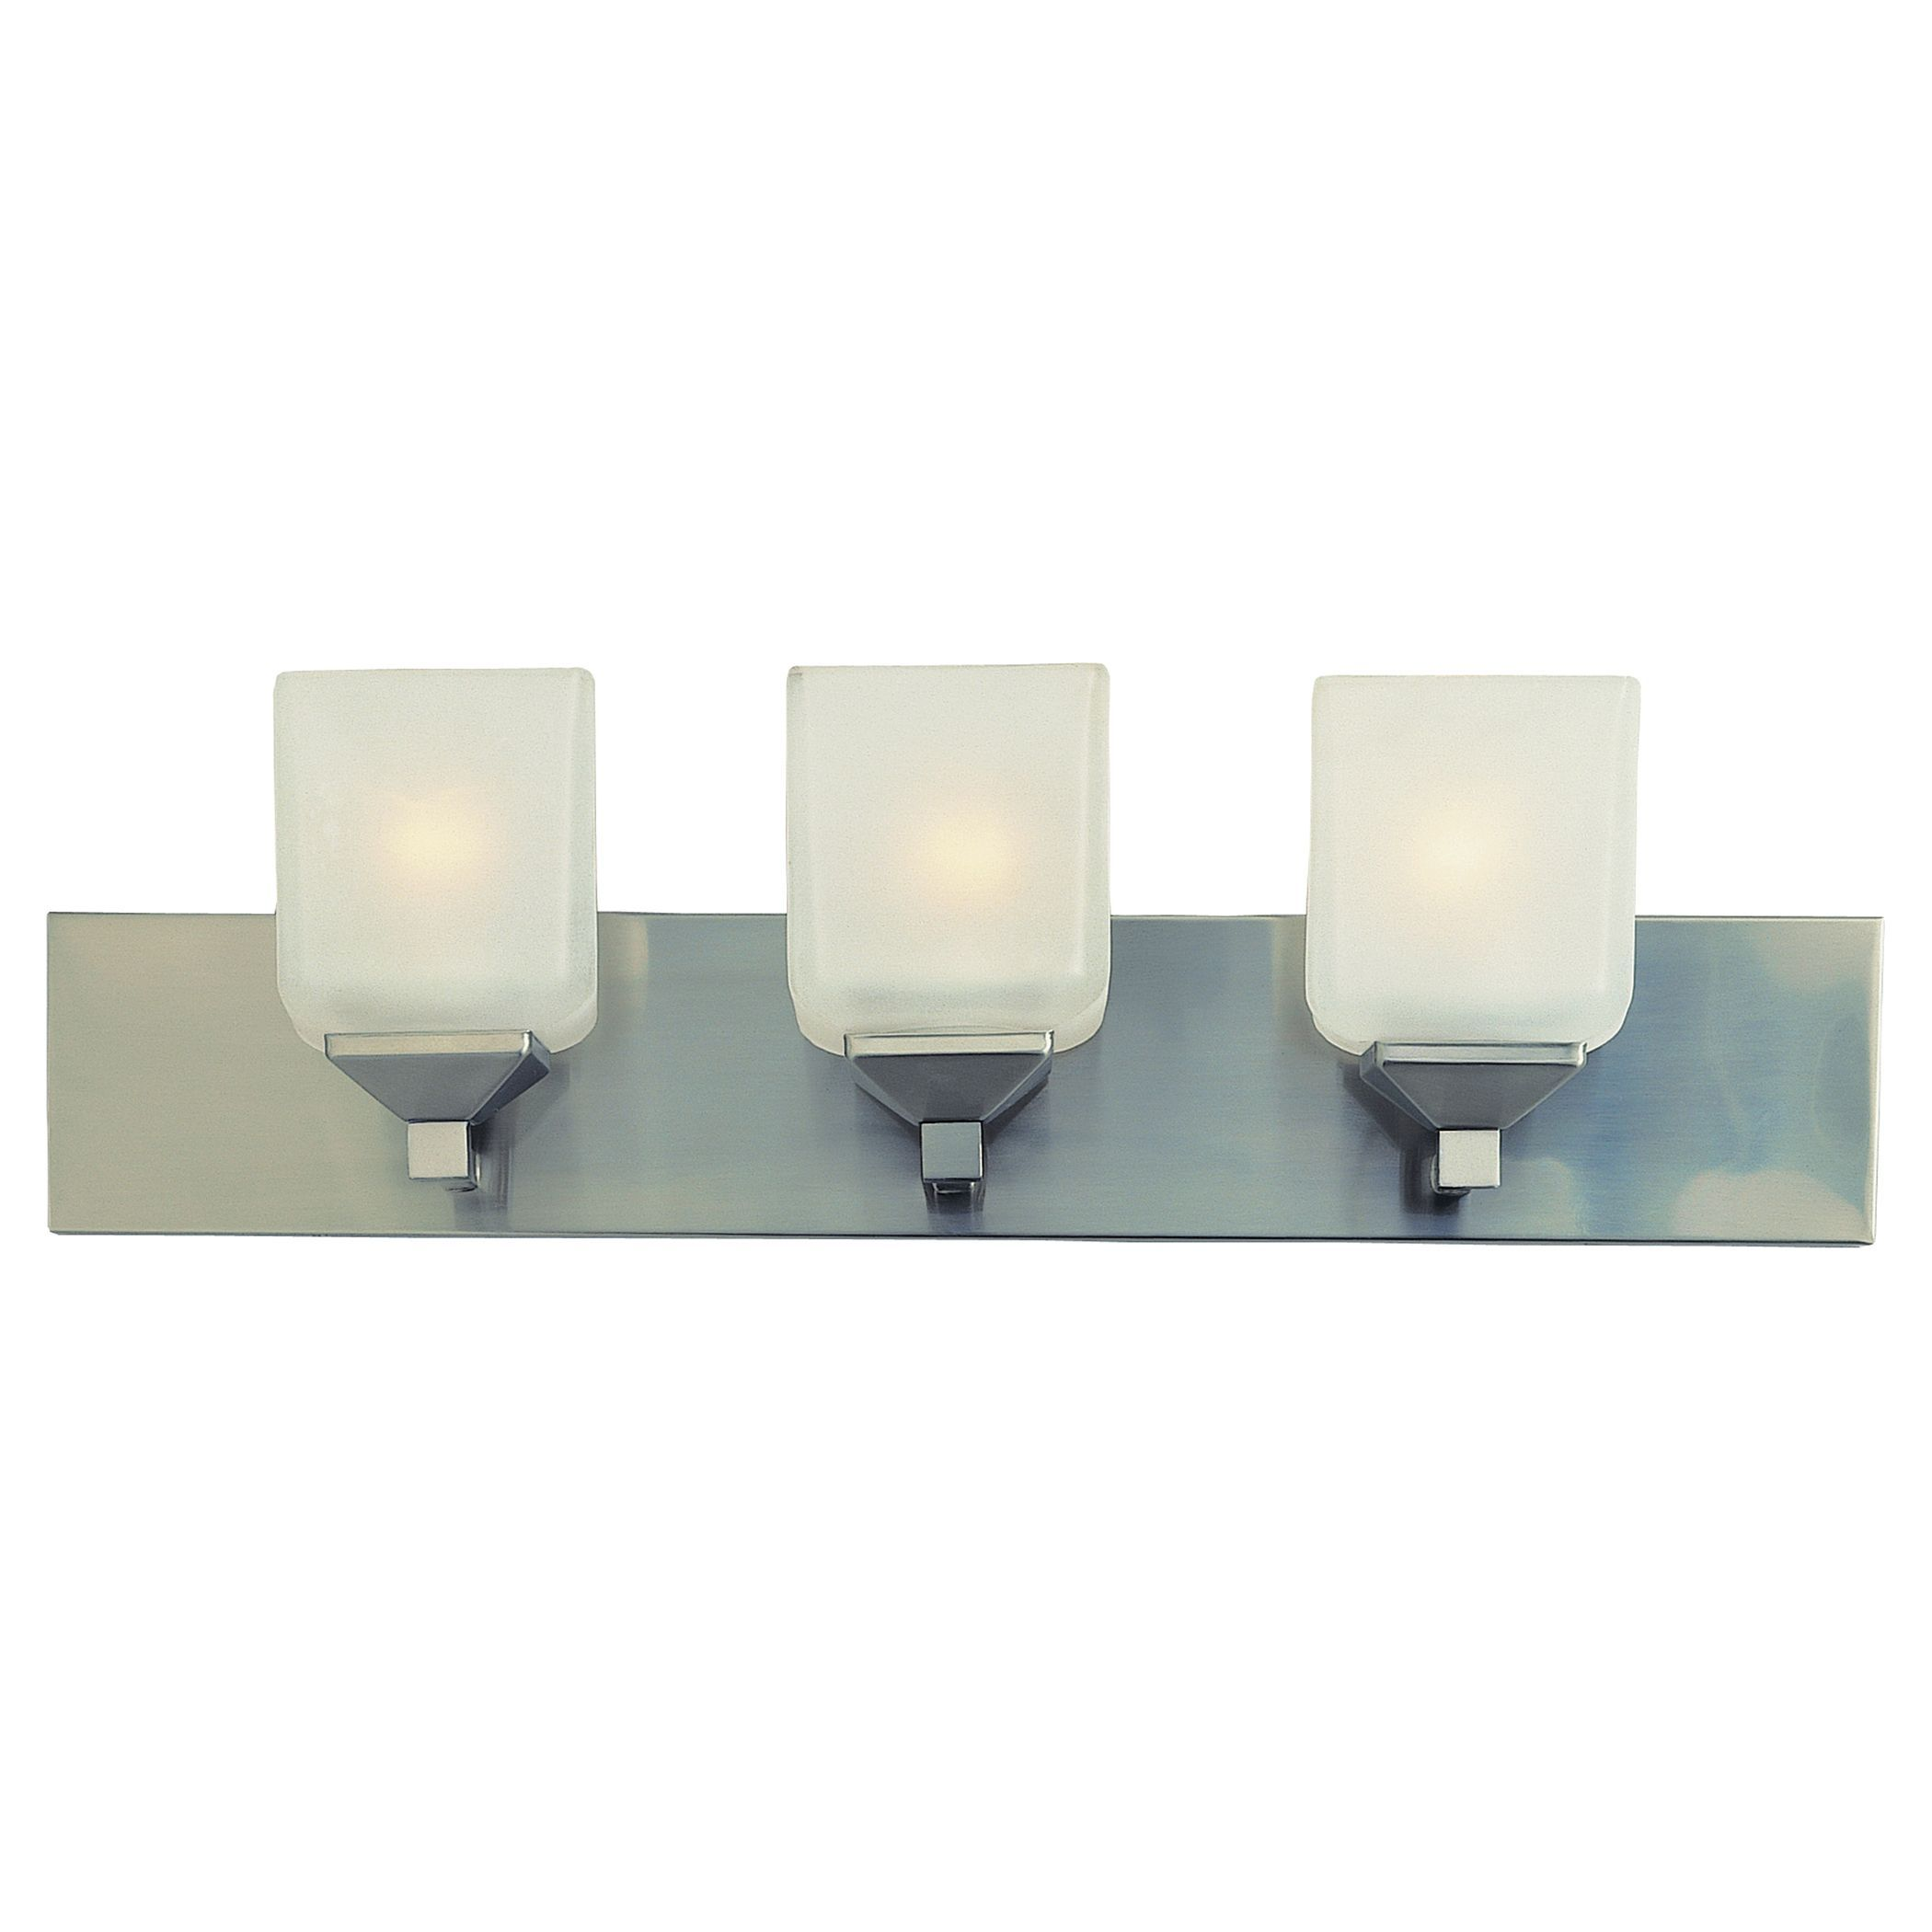 Bel Air Lighting CB-2803-PW 3 Light Pewter Cube Bath Bar (Lights ...